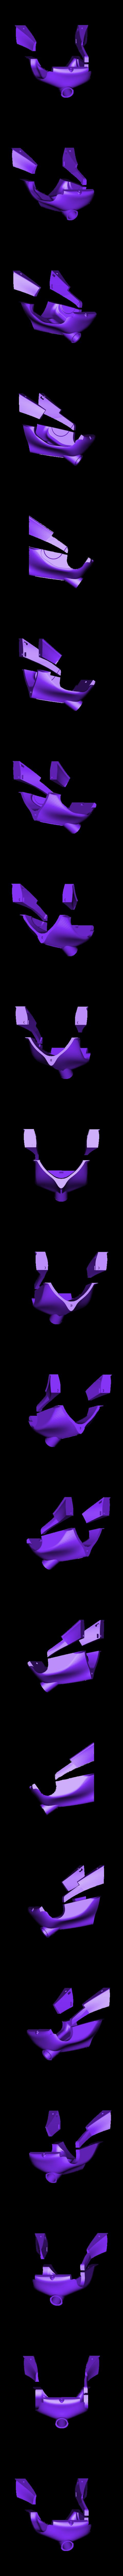 OpenRC_2017_MCL_Motor_Cover_Color1.stl Download free STL file OpenRC F1 Dual Color McLaren Edition • 3D printer model, DanielNoree